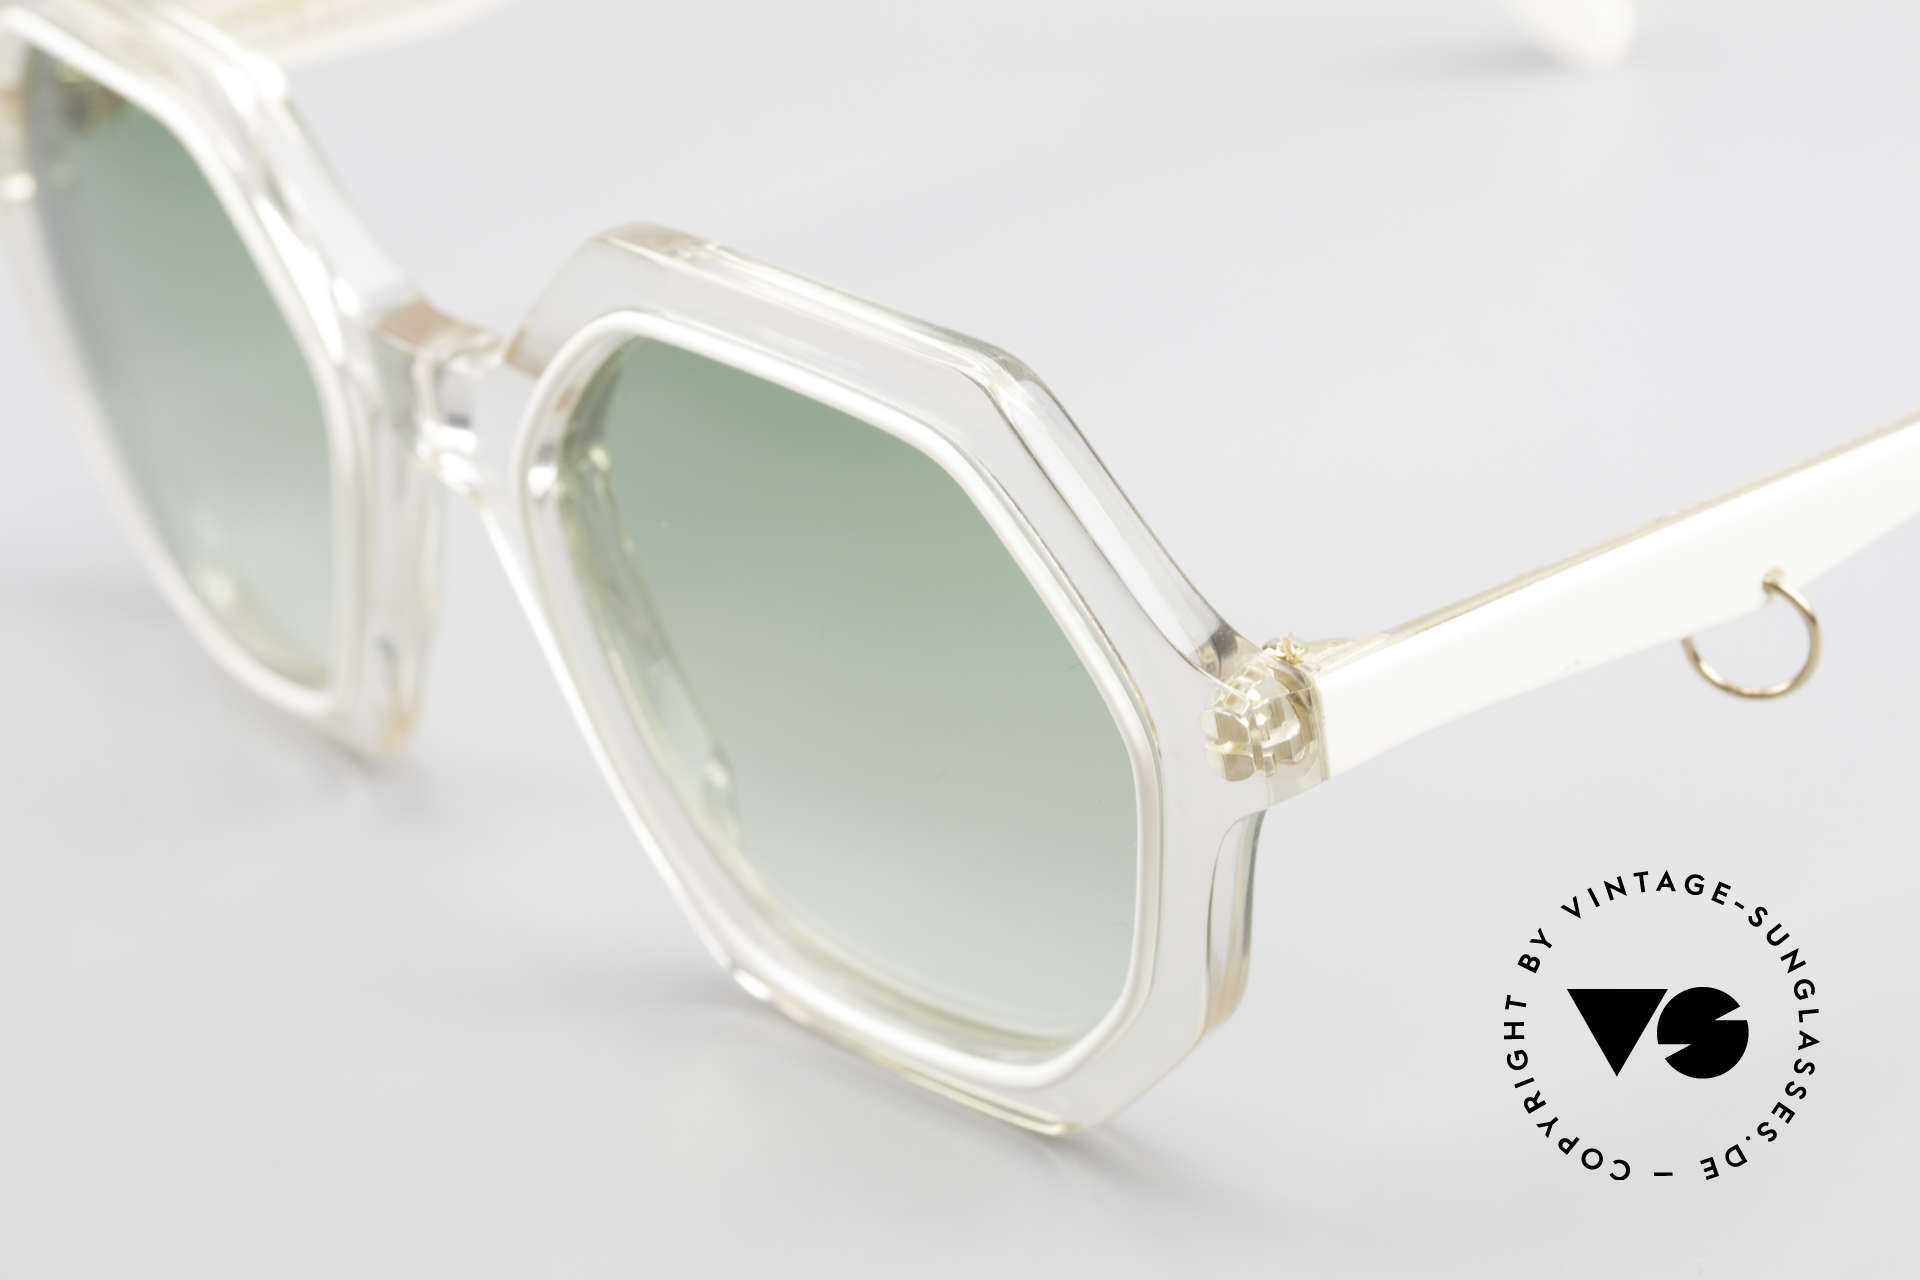 Sonia Rykiel SR46 444 Octagonal Sunglasses 1970's, unworn designer piece (like all our vintage sunglasses), Made for Women